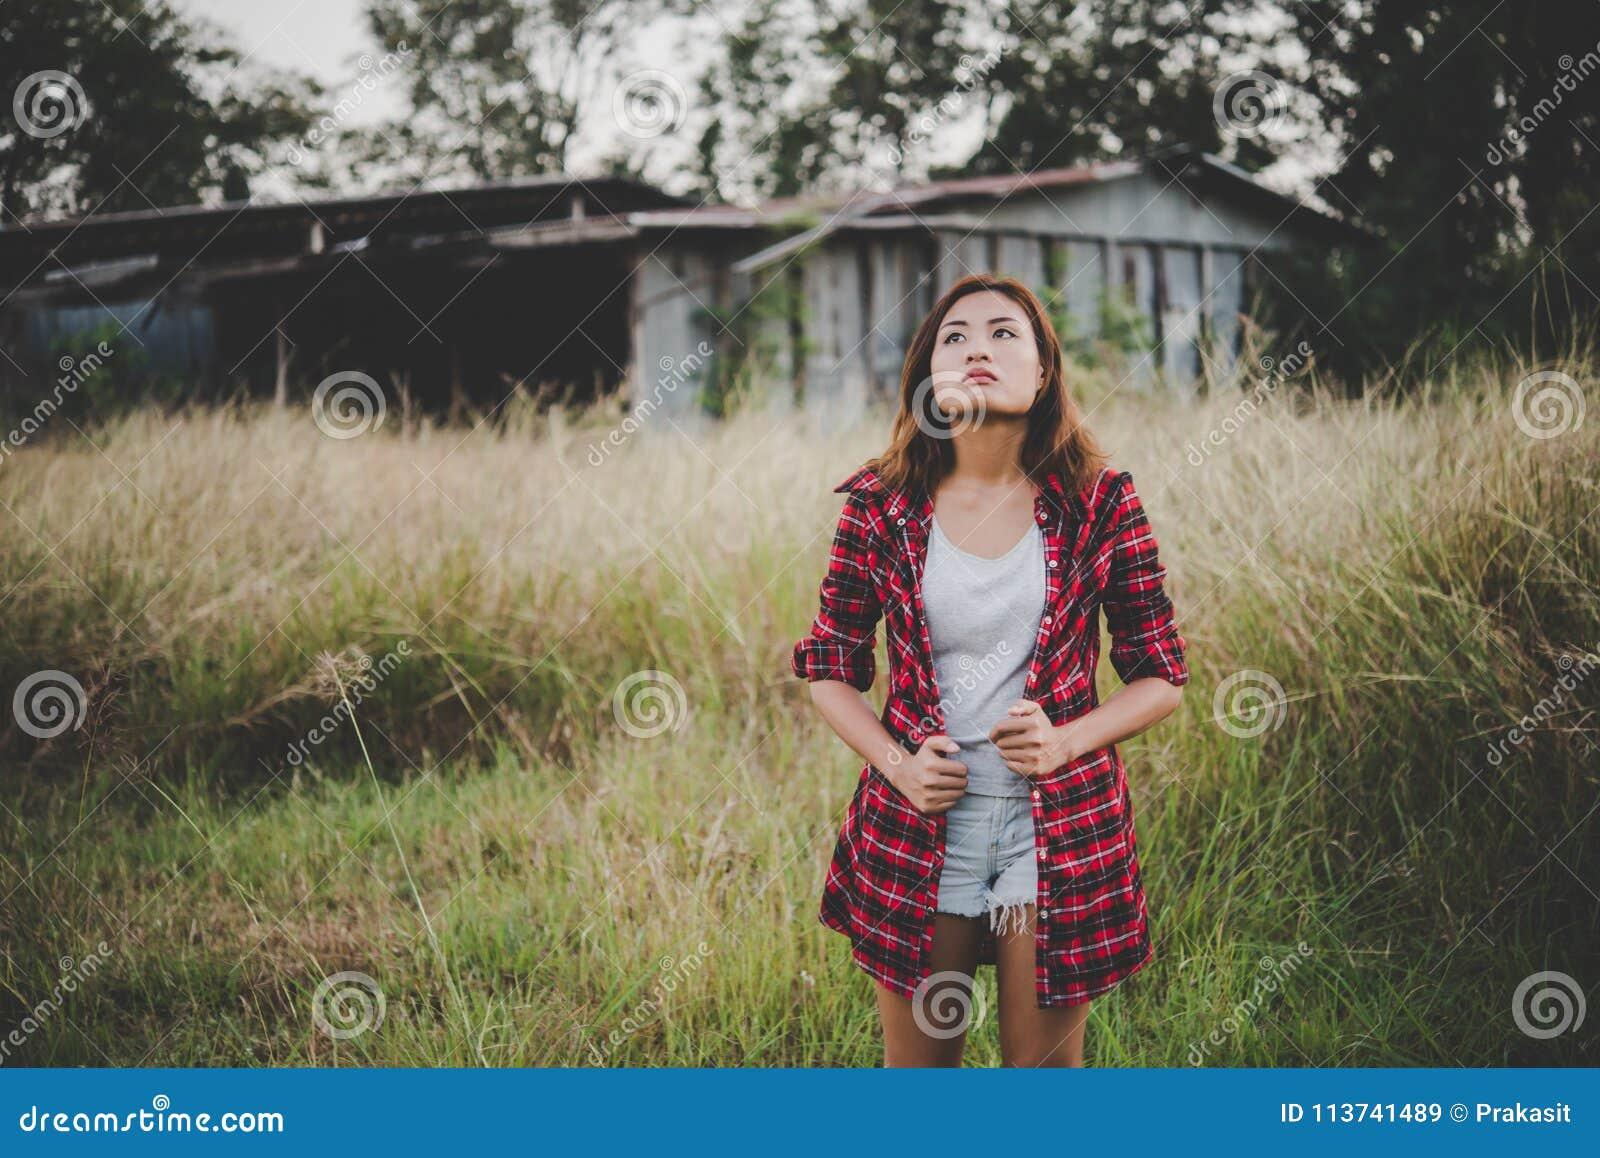 Young beautiful woman walking through in summer field, Freedom e